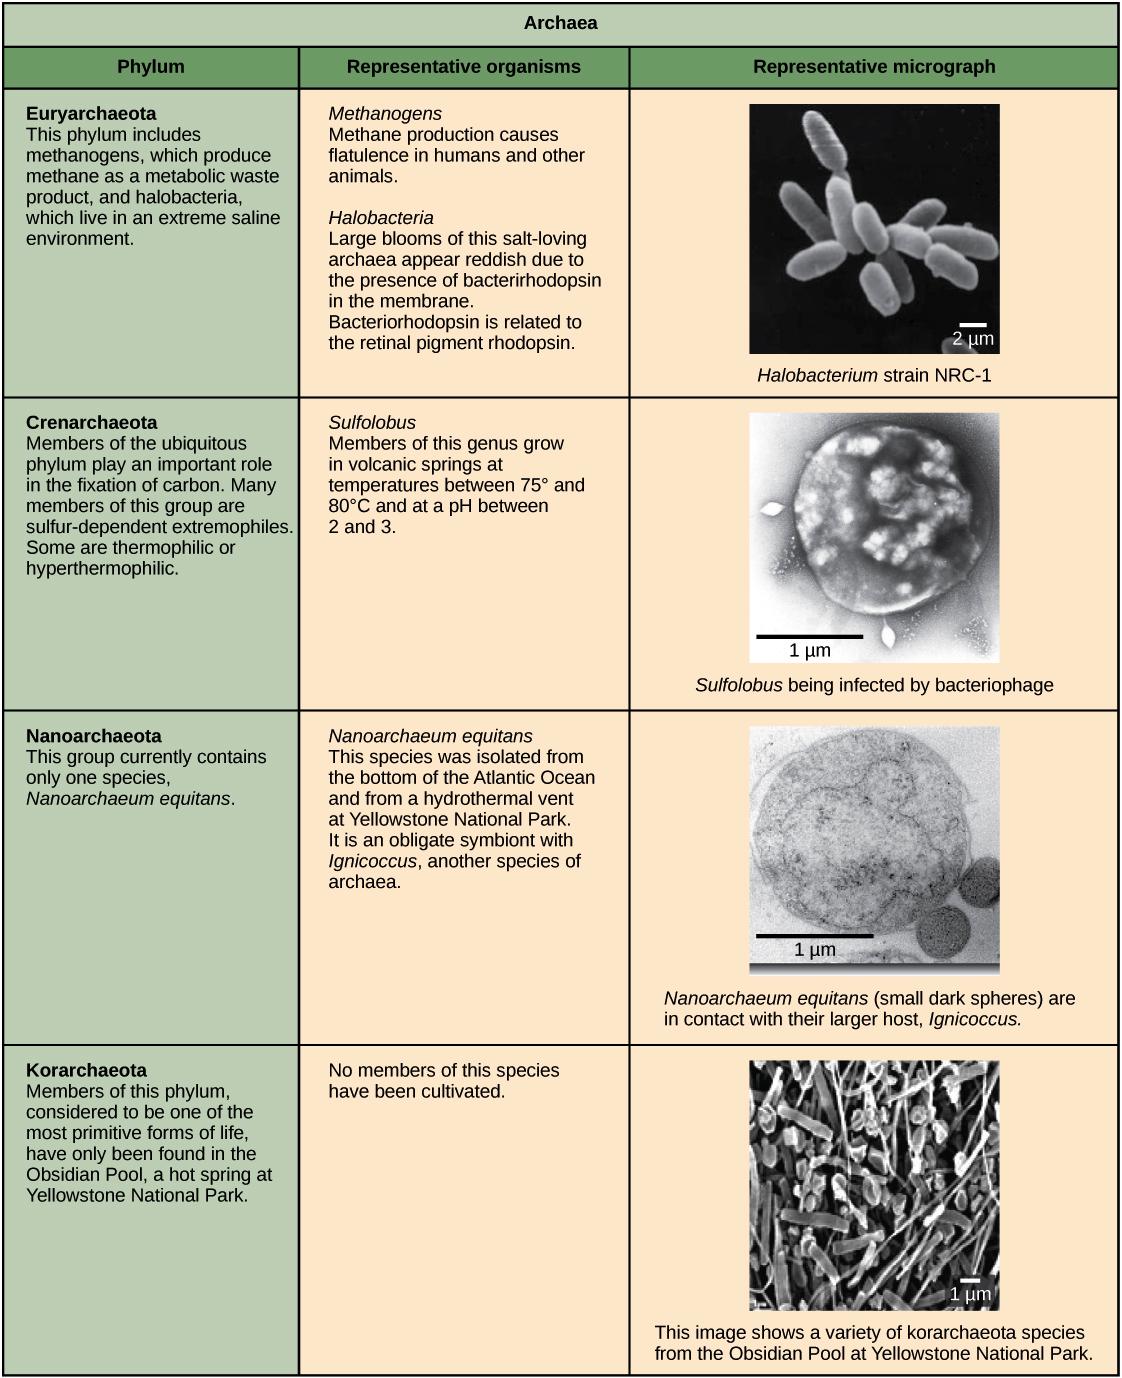 Prokaryote Classification And Diversity Article Khan Academy